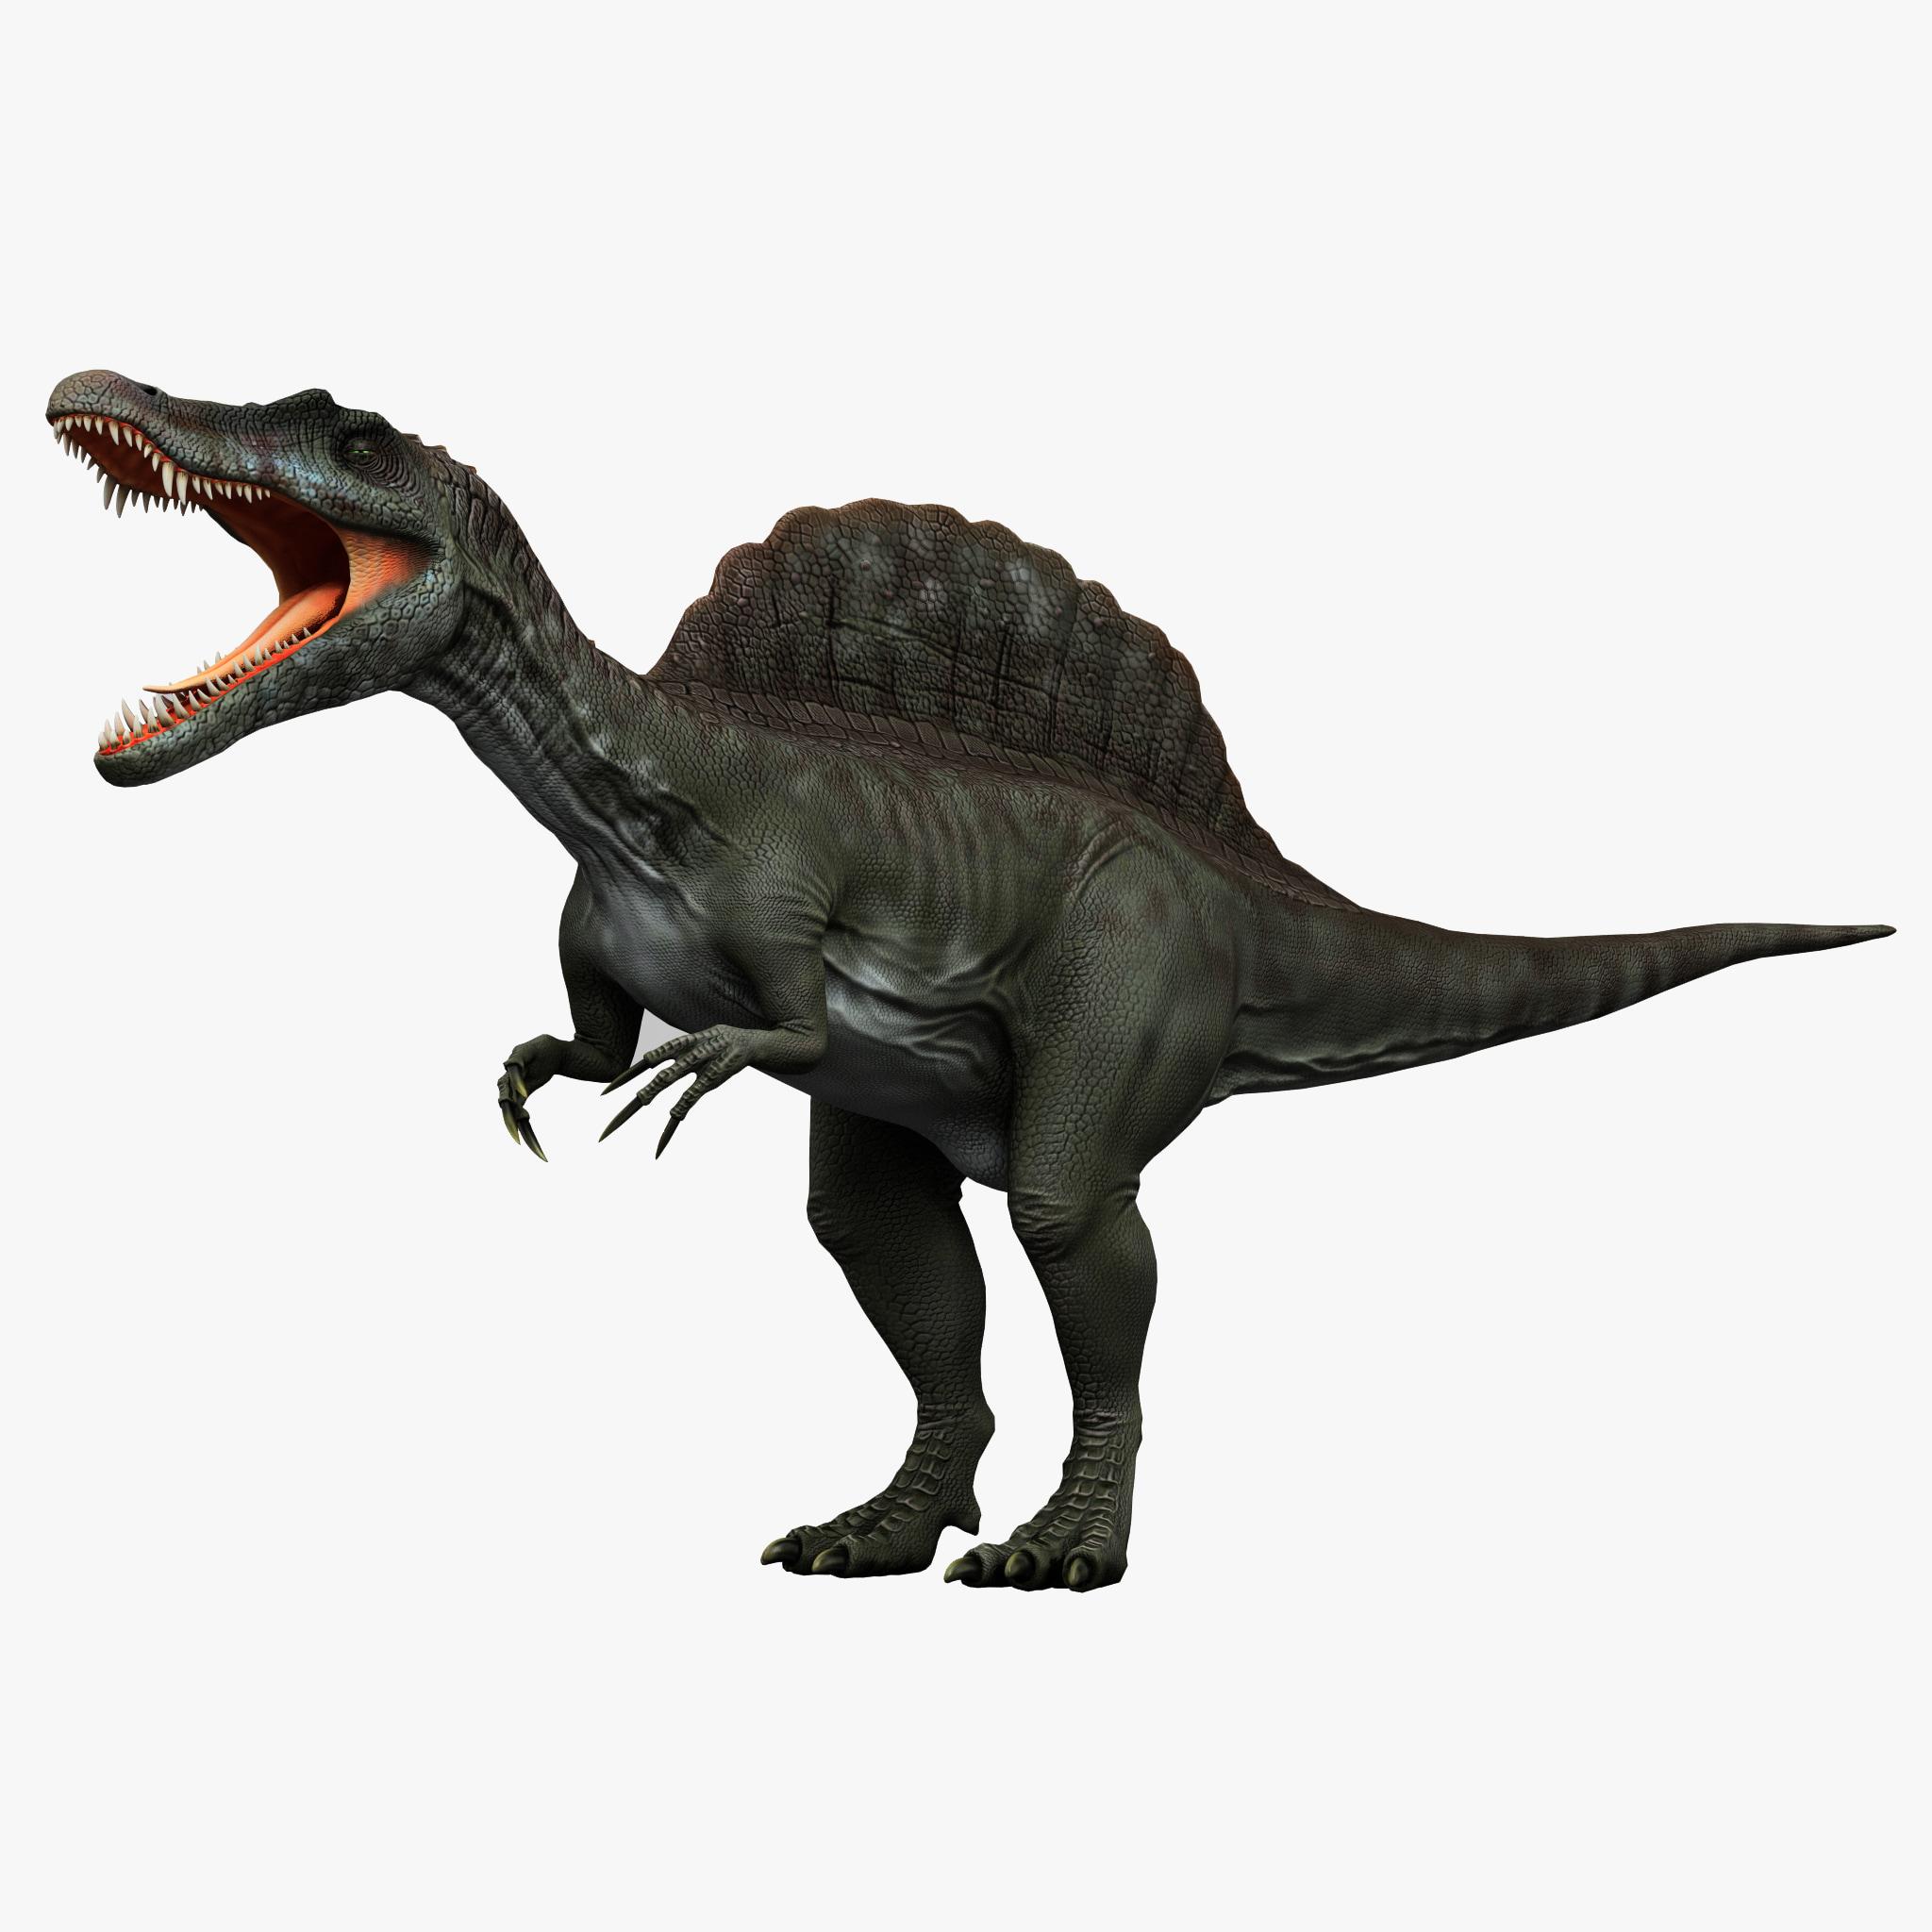 3dsmax Spinosaurus Prehistoric Modelled